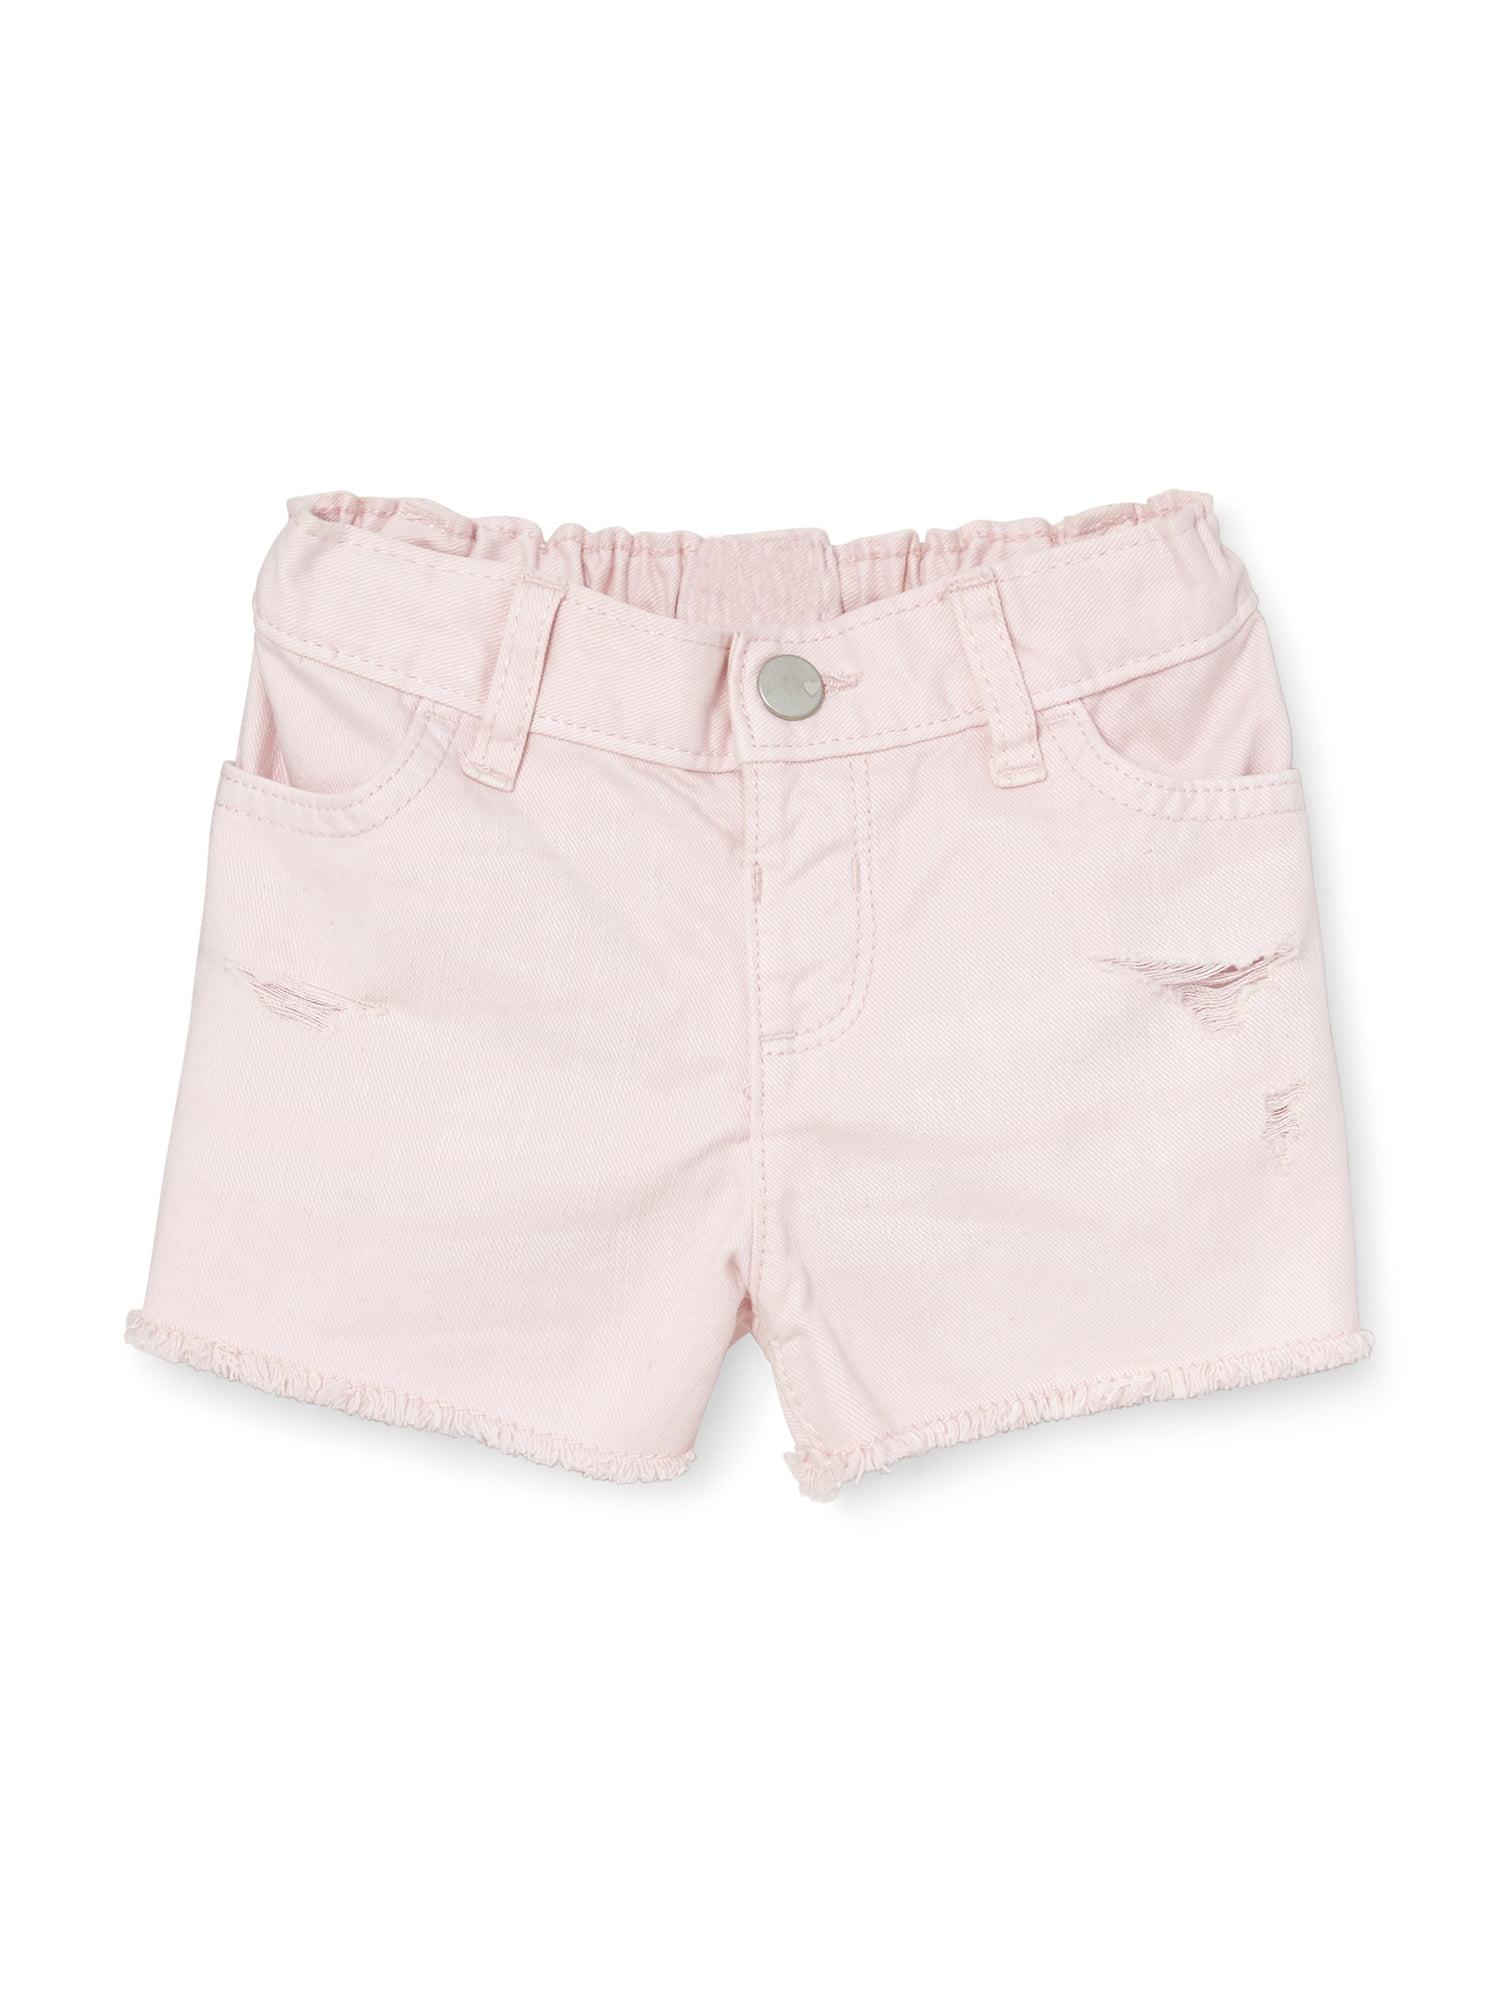 Destructed Denim Shorts (Baby Girls & Toddler Girls)